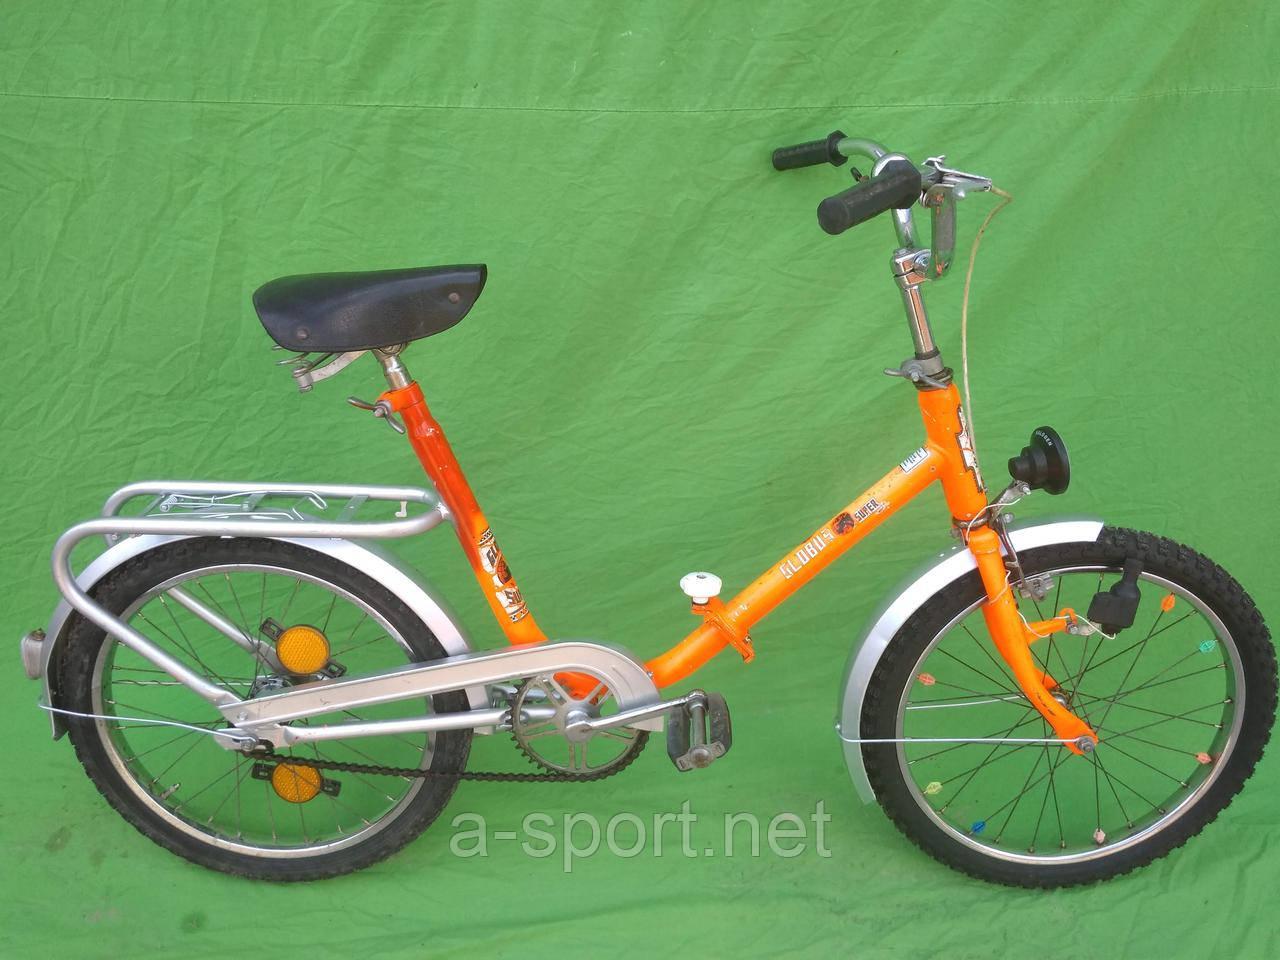 Складний велосипед Globus, колеса 20